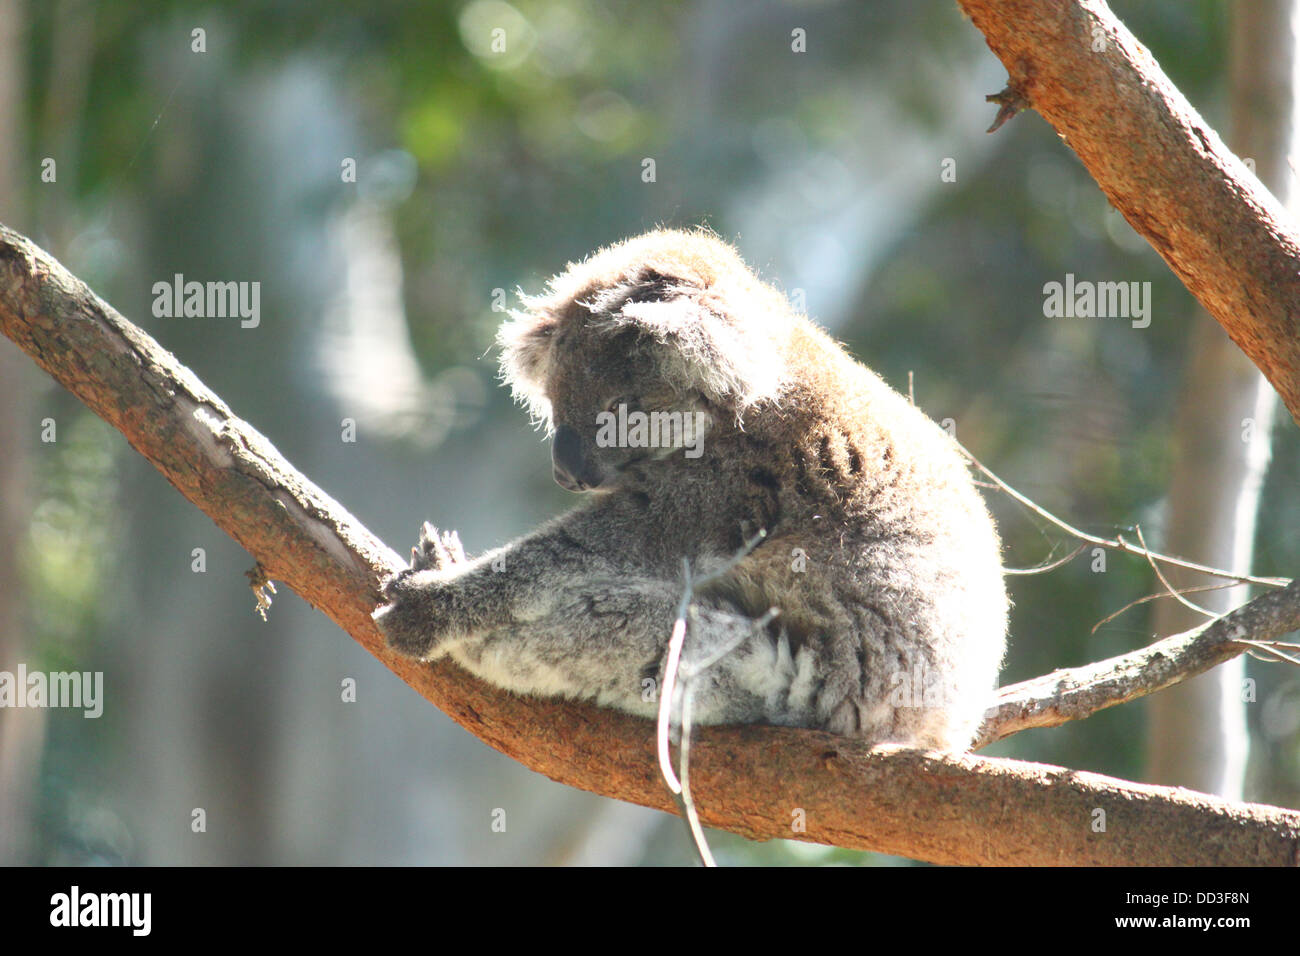 Animals, Tiere, Natur, Nature, - Stock Image